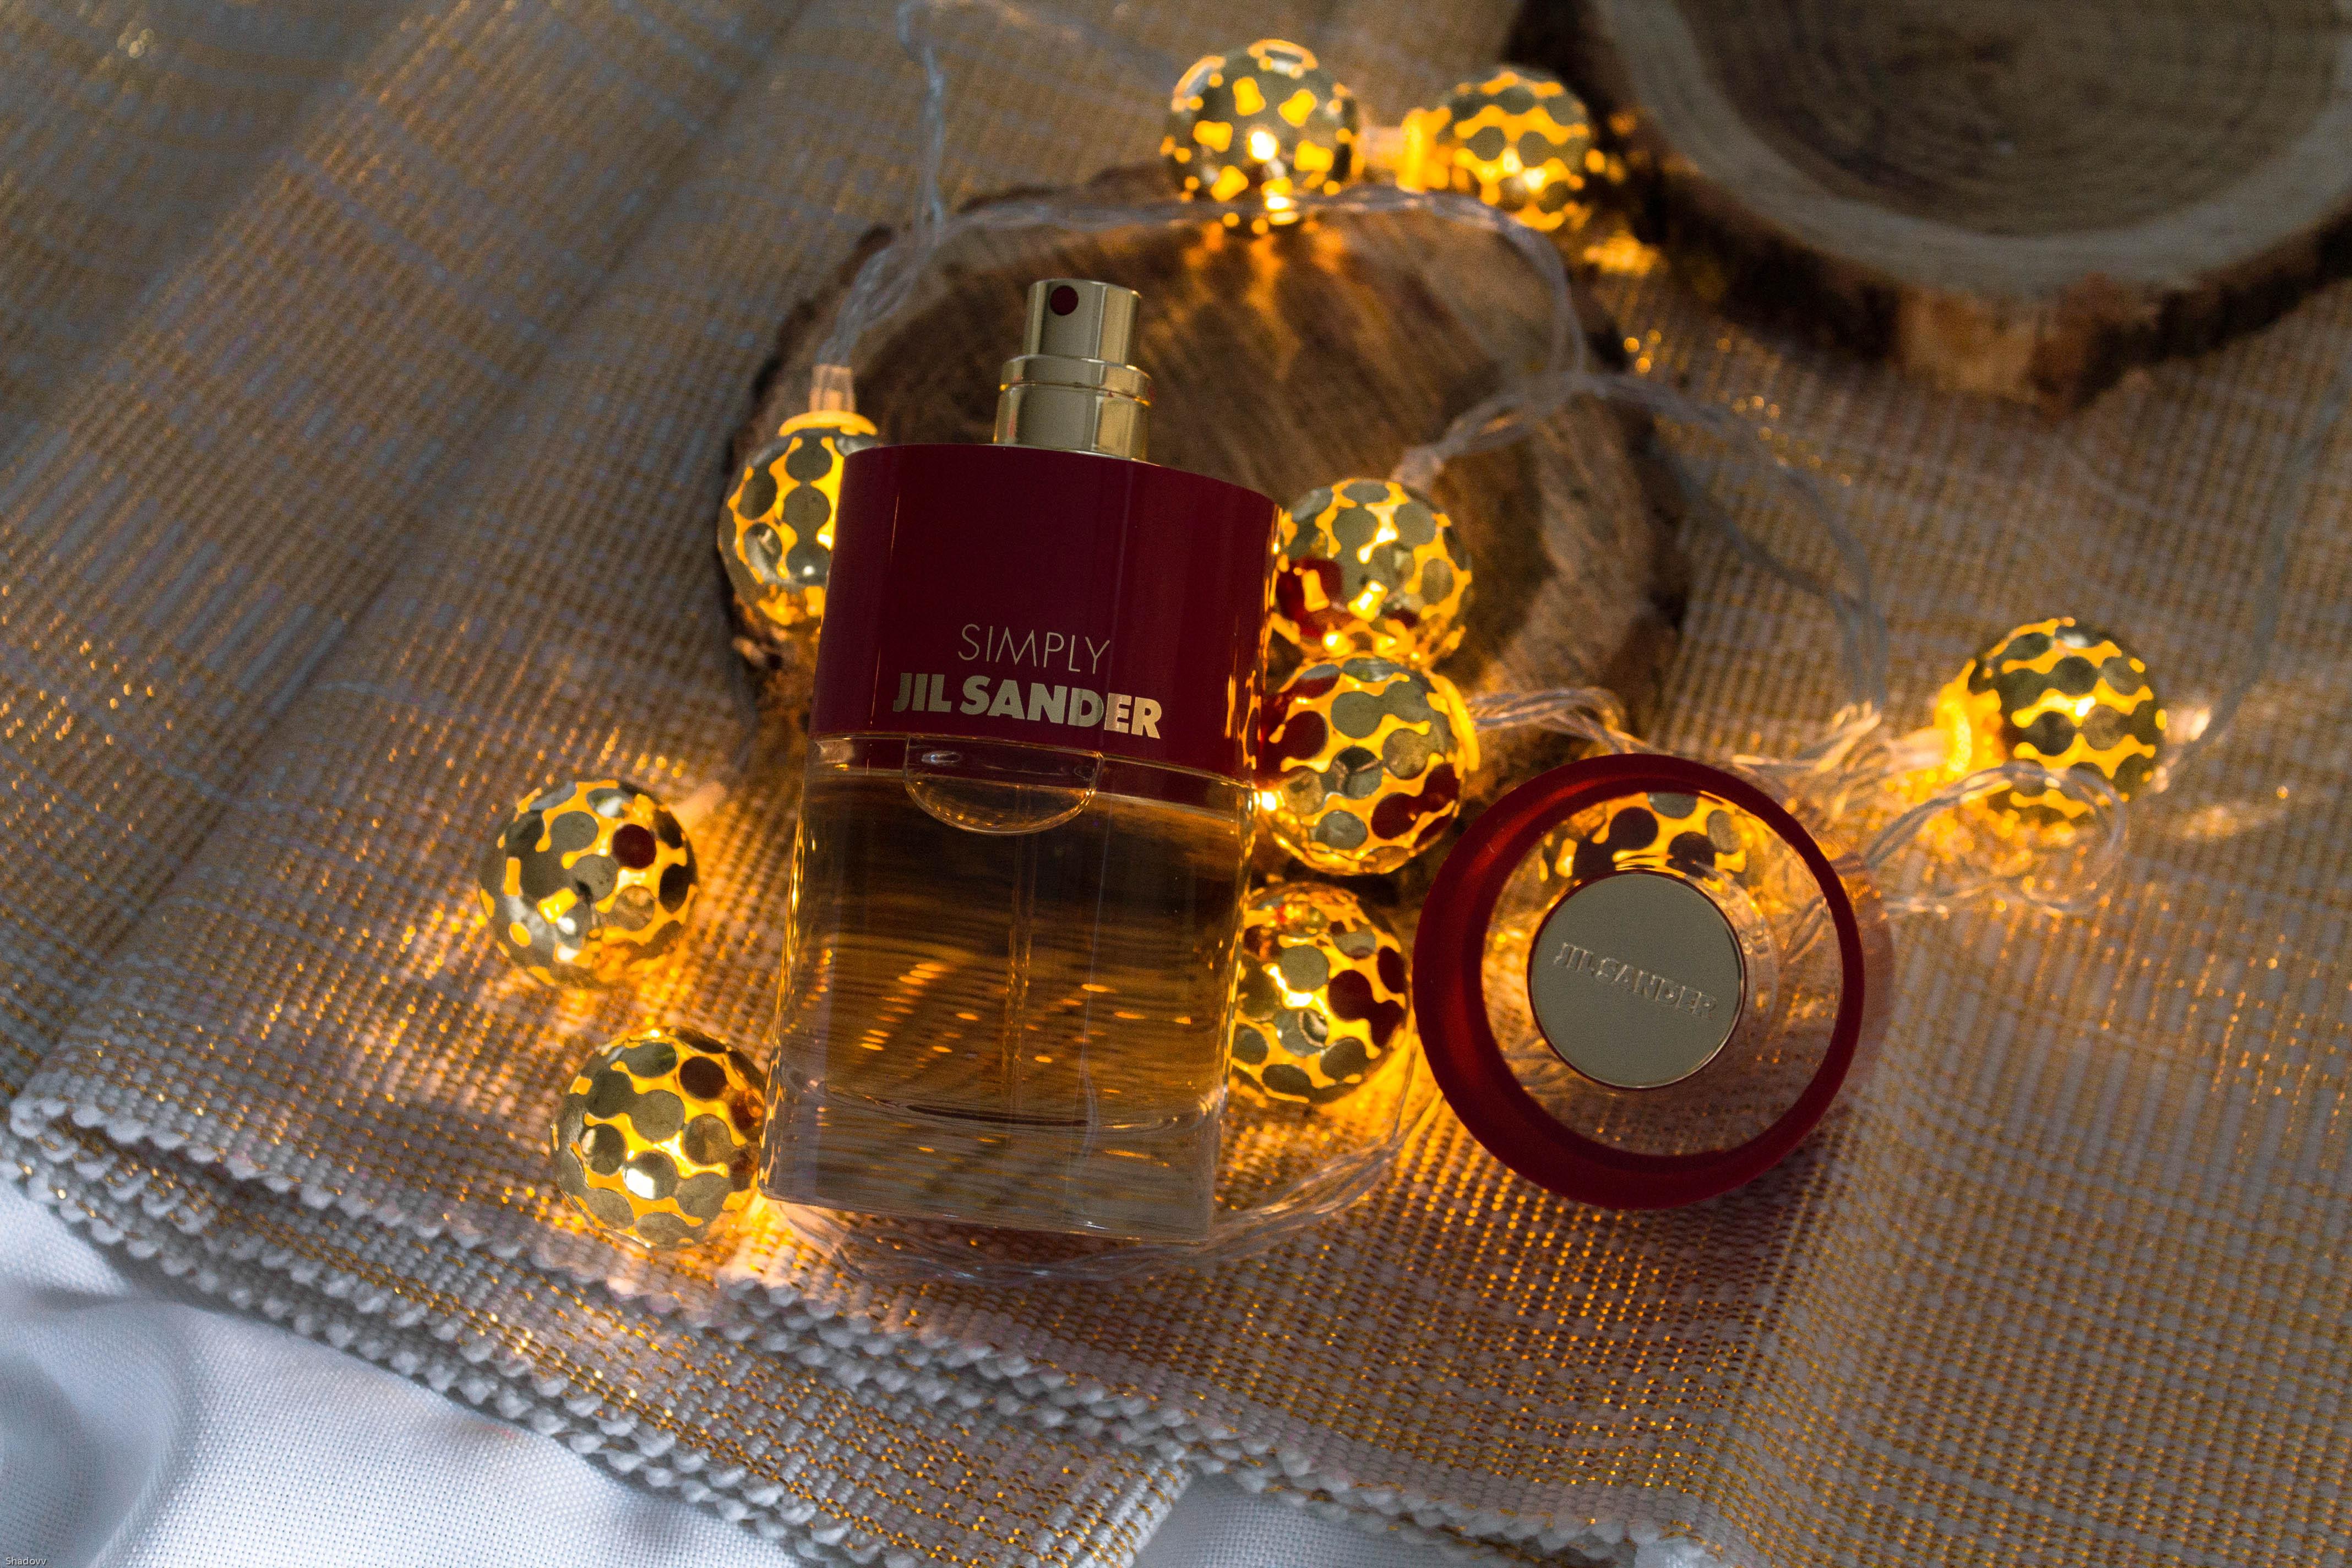 jil sander parfum simply kardiaserena gold red